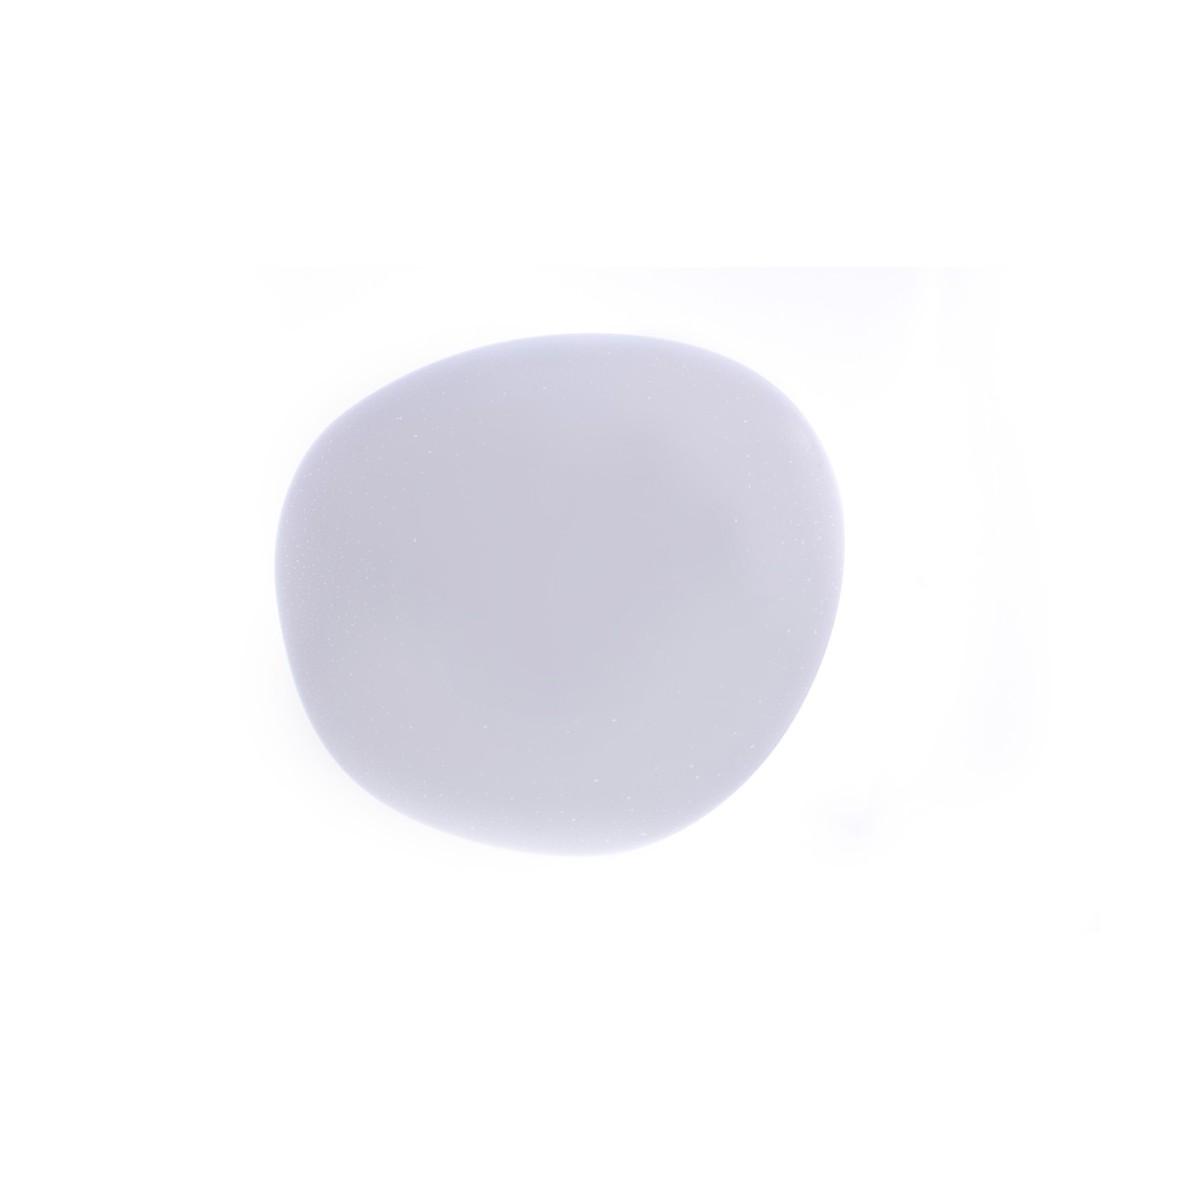 PLAFÓN LED REYS 36W DIFUSOR MATE